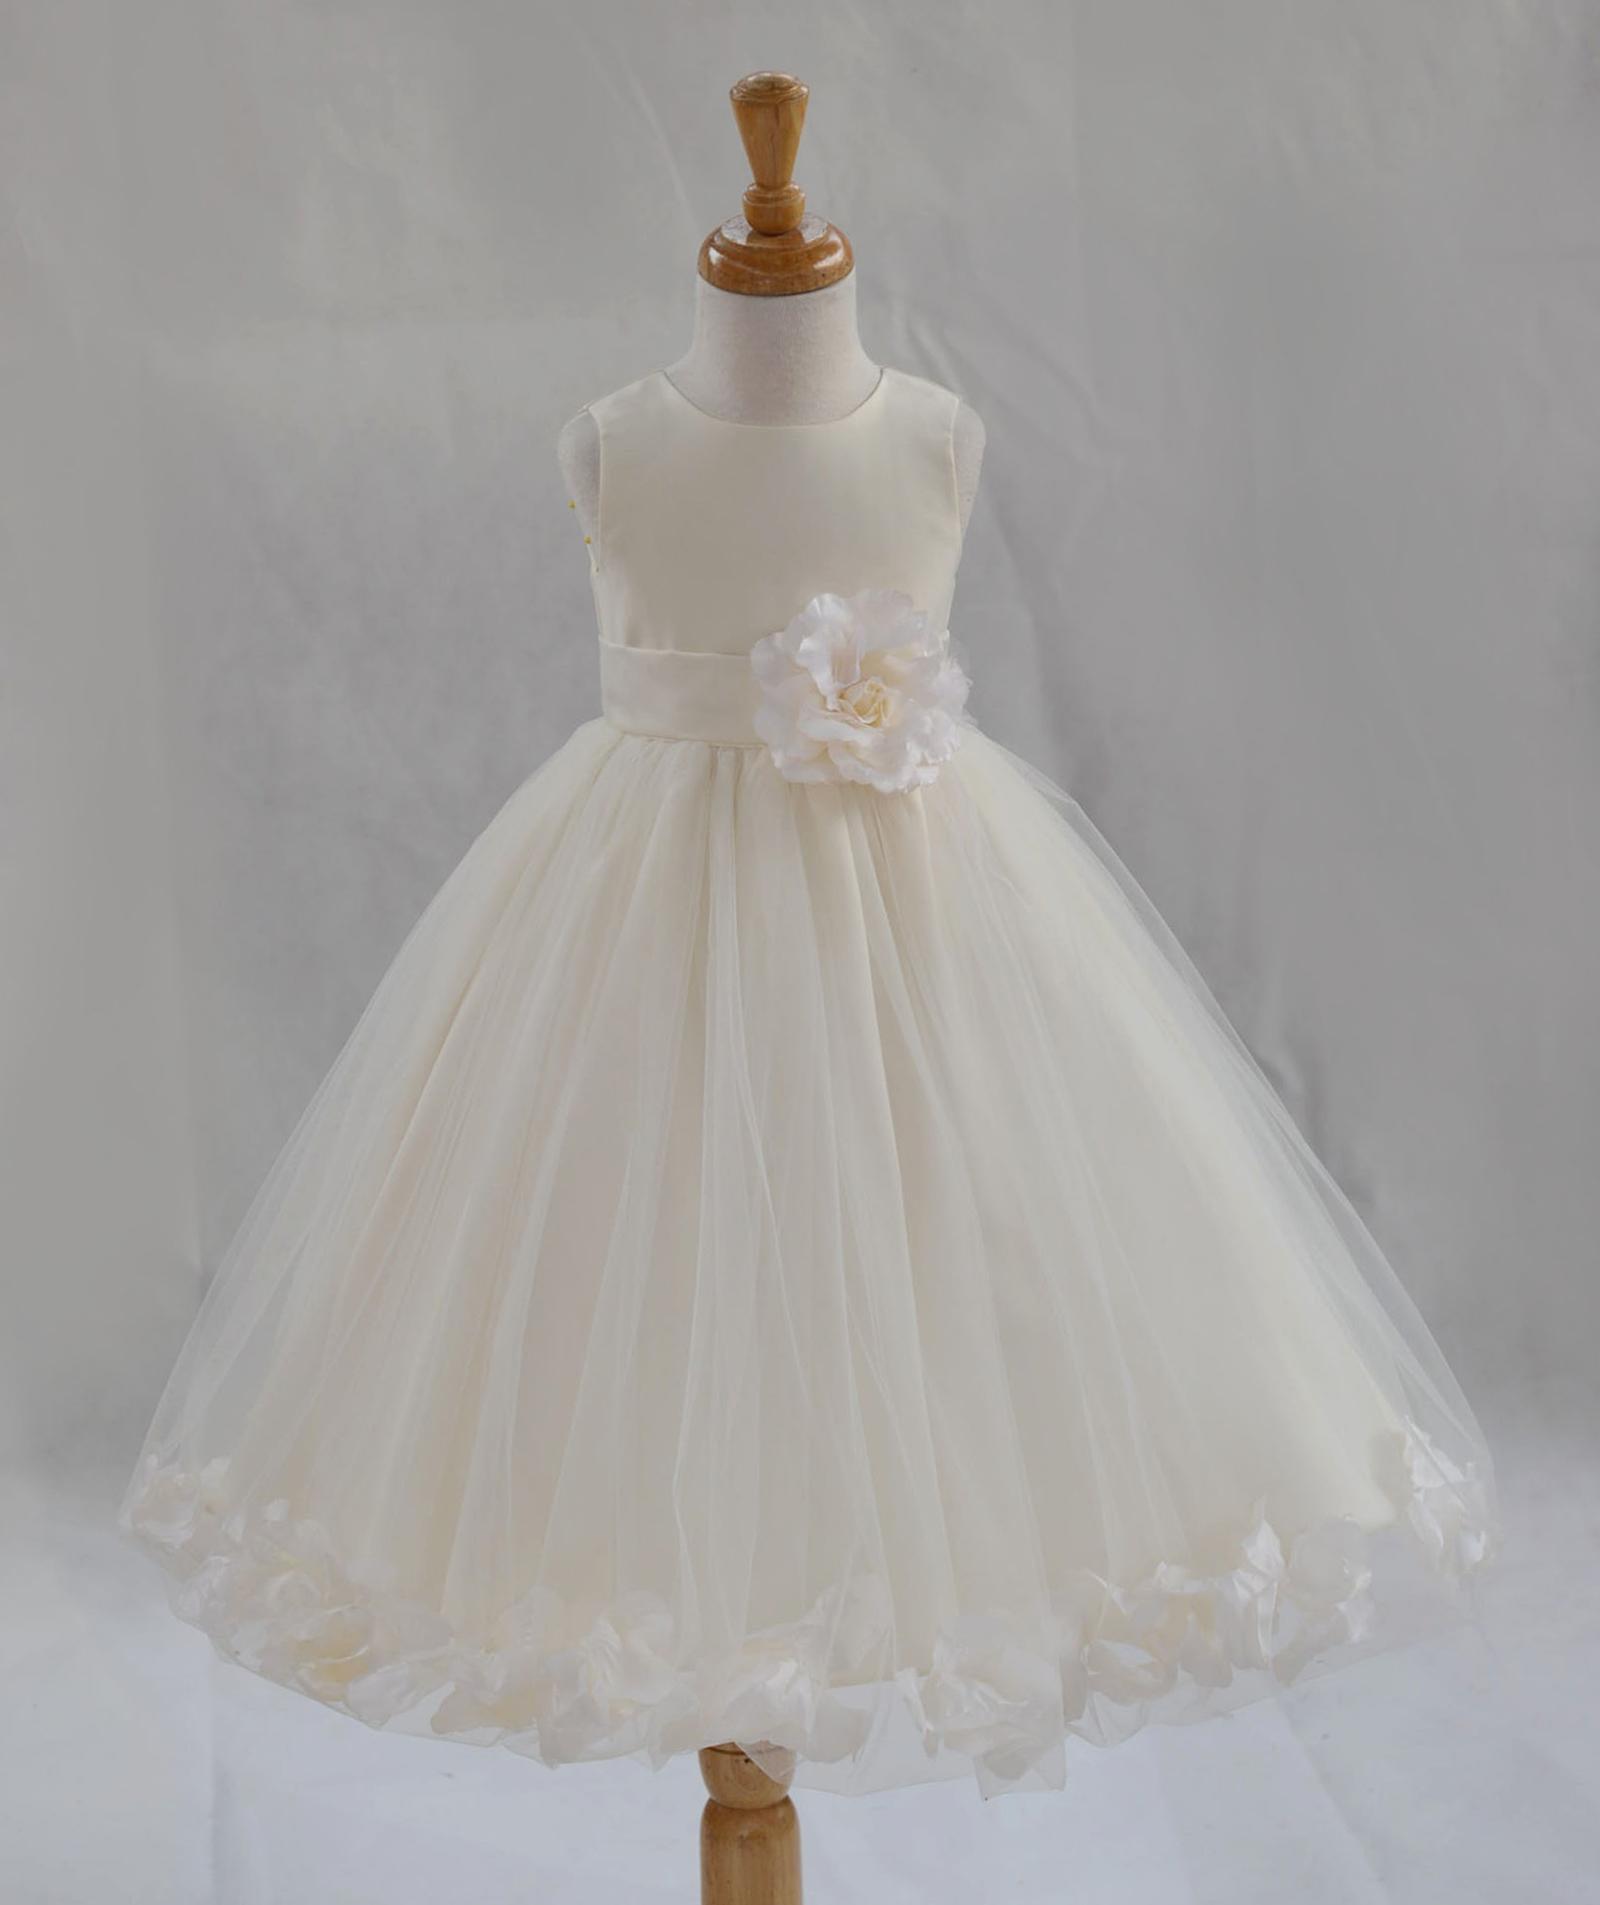 IVORY ROSE Flower Girl Dress Wedding Bridesmaid Formal Recital Graduation Party